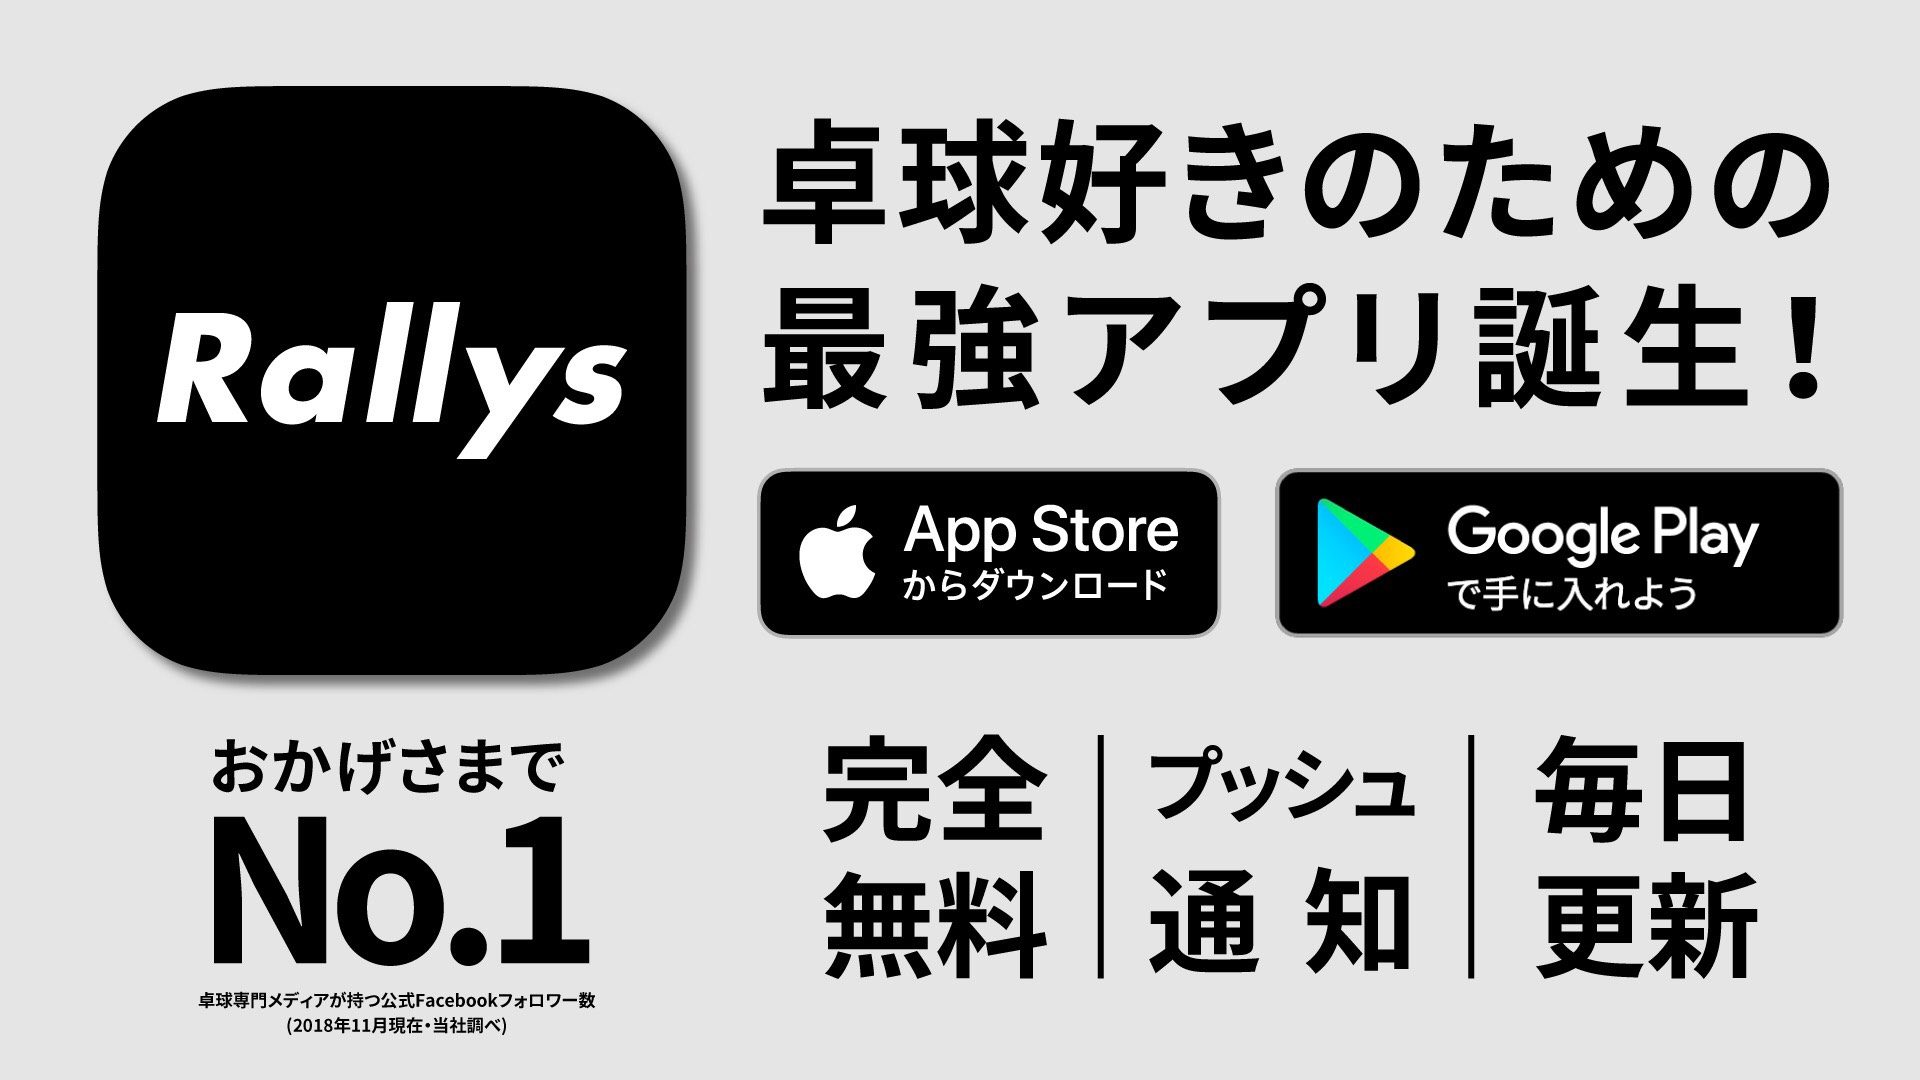 【Rallys公式アプリ】朗報!「全日本カテゴリ」を追加しました